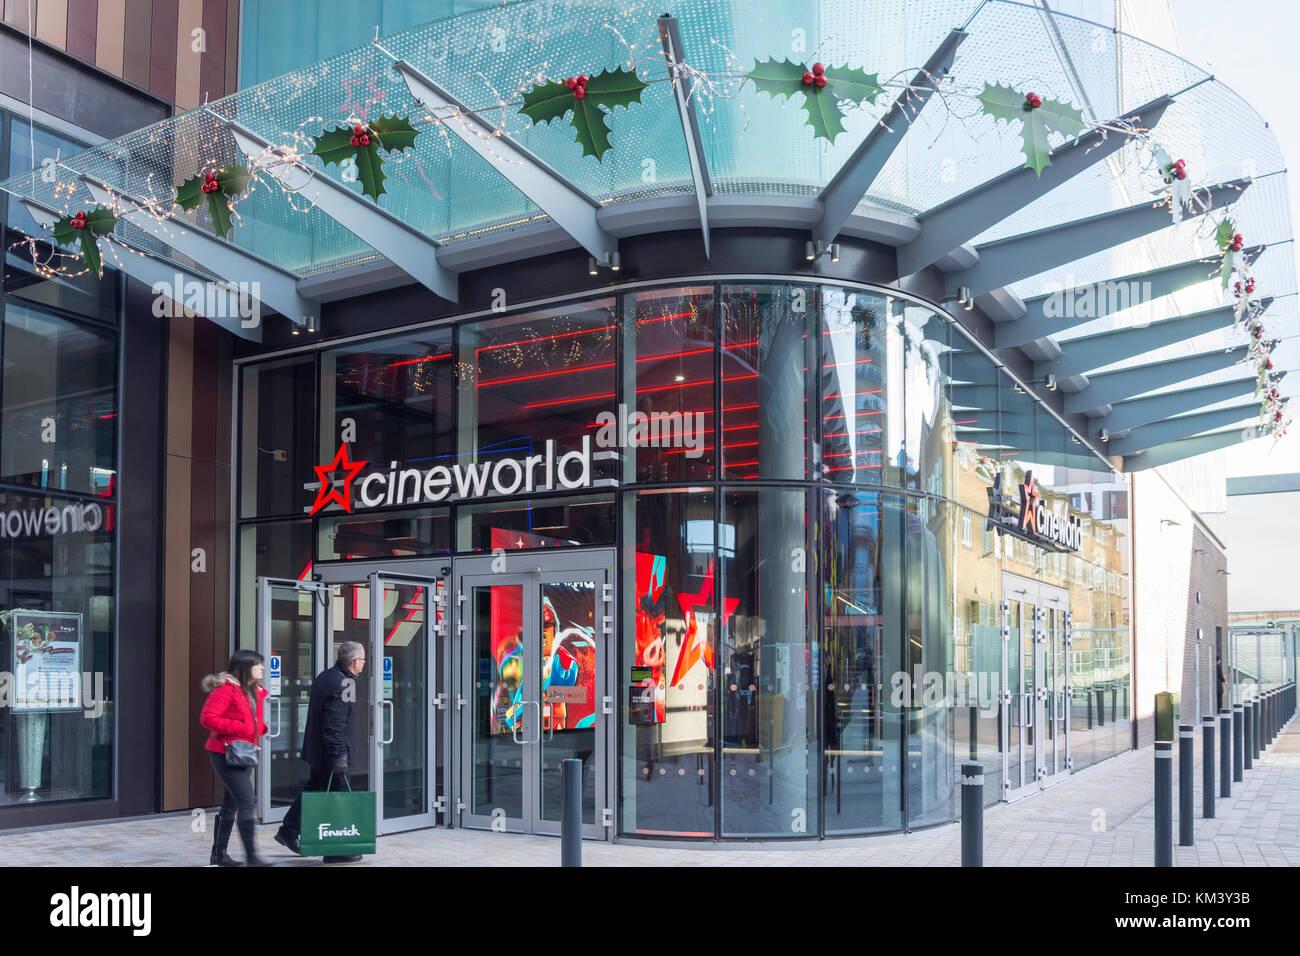 Cineworld Cinema, The Lexicon shopping centre, Eagle Lane, Bracknell, Berkshire, England, United Kingdom - Stock Image